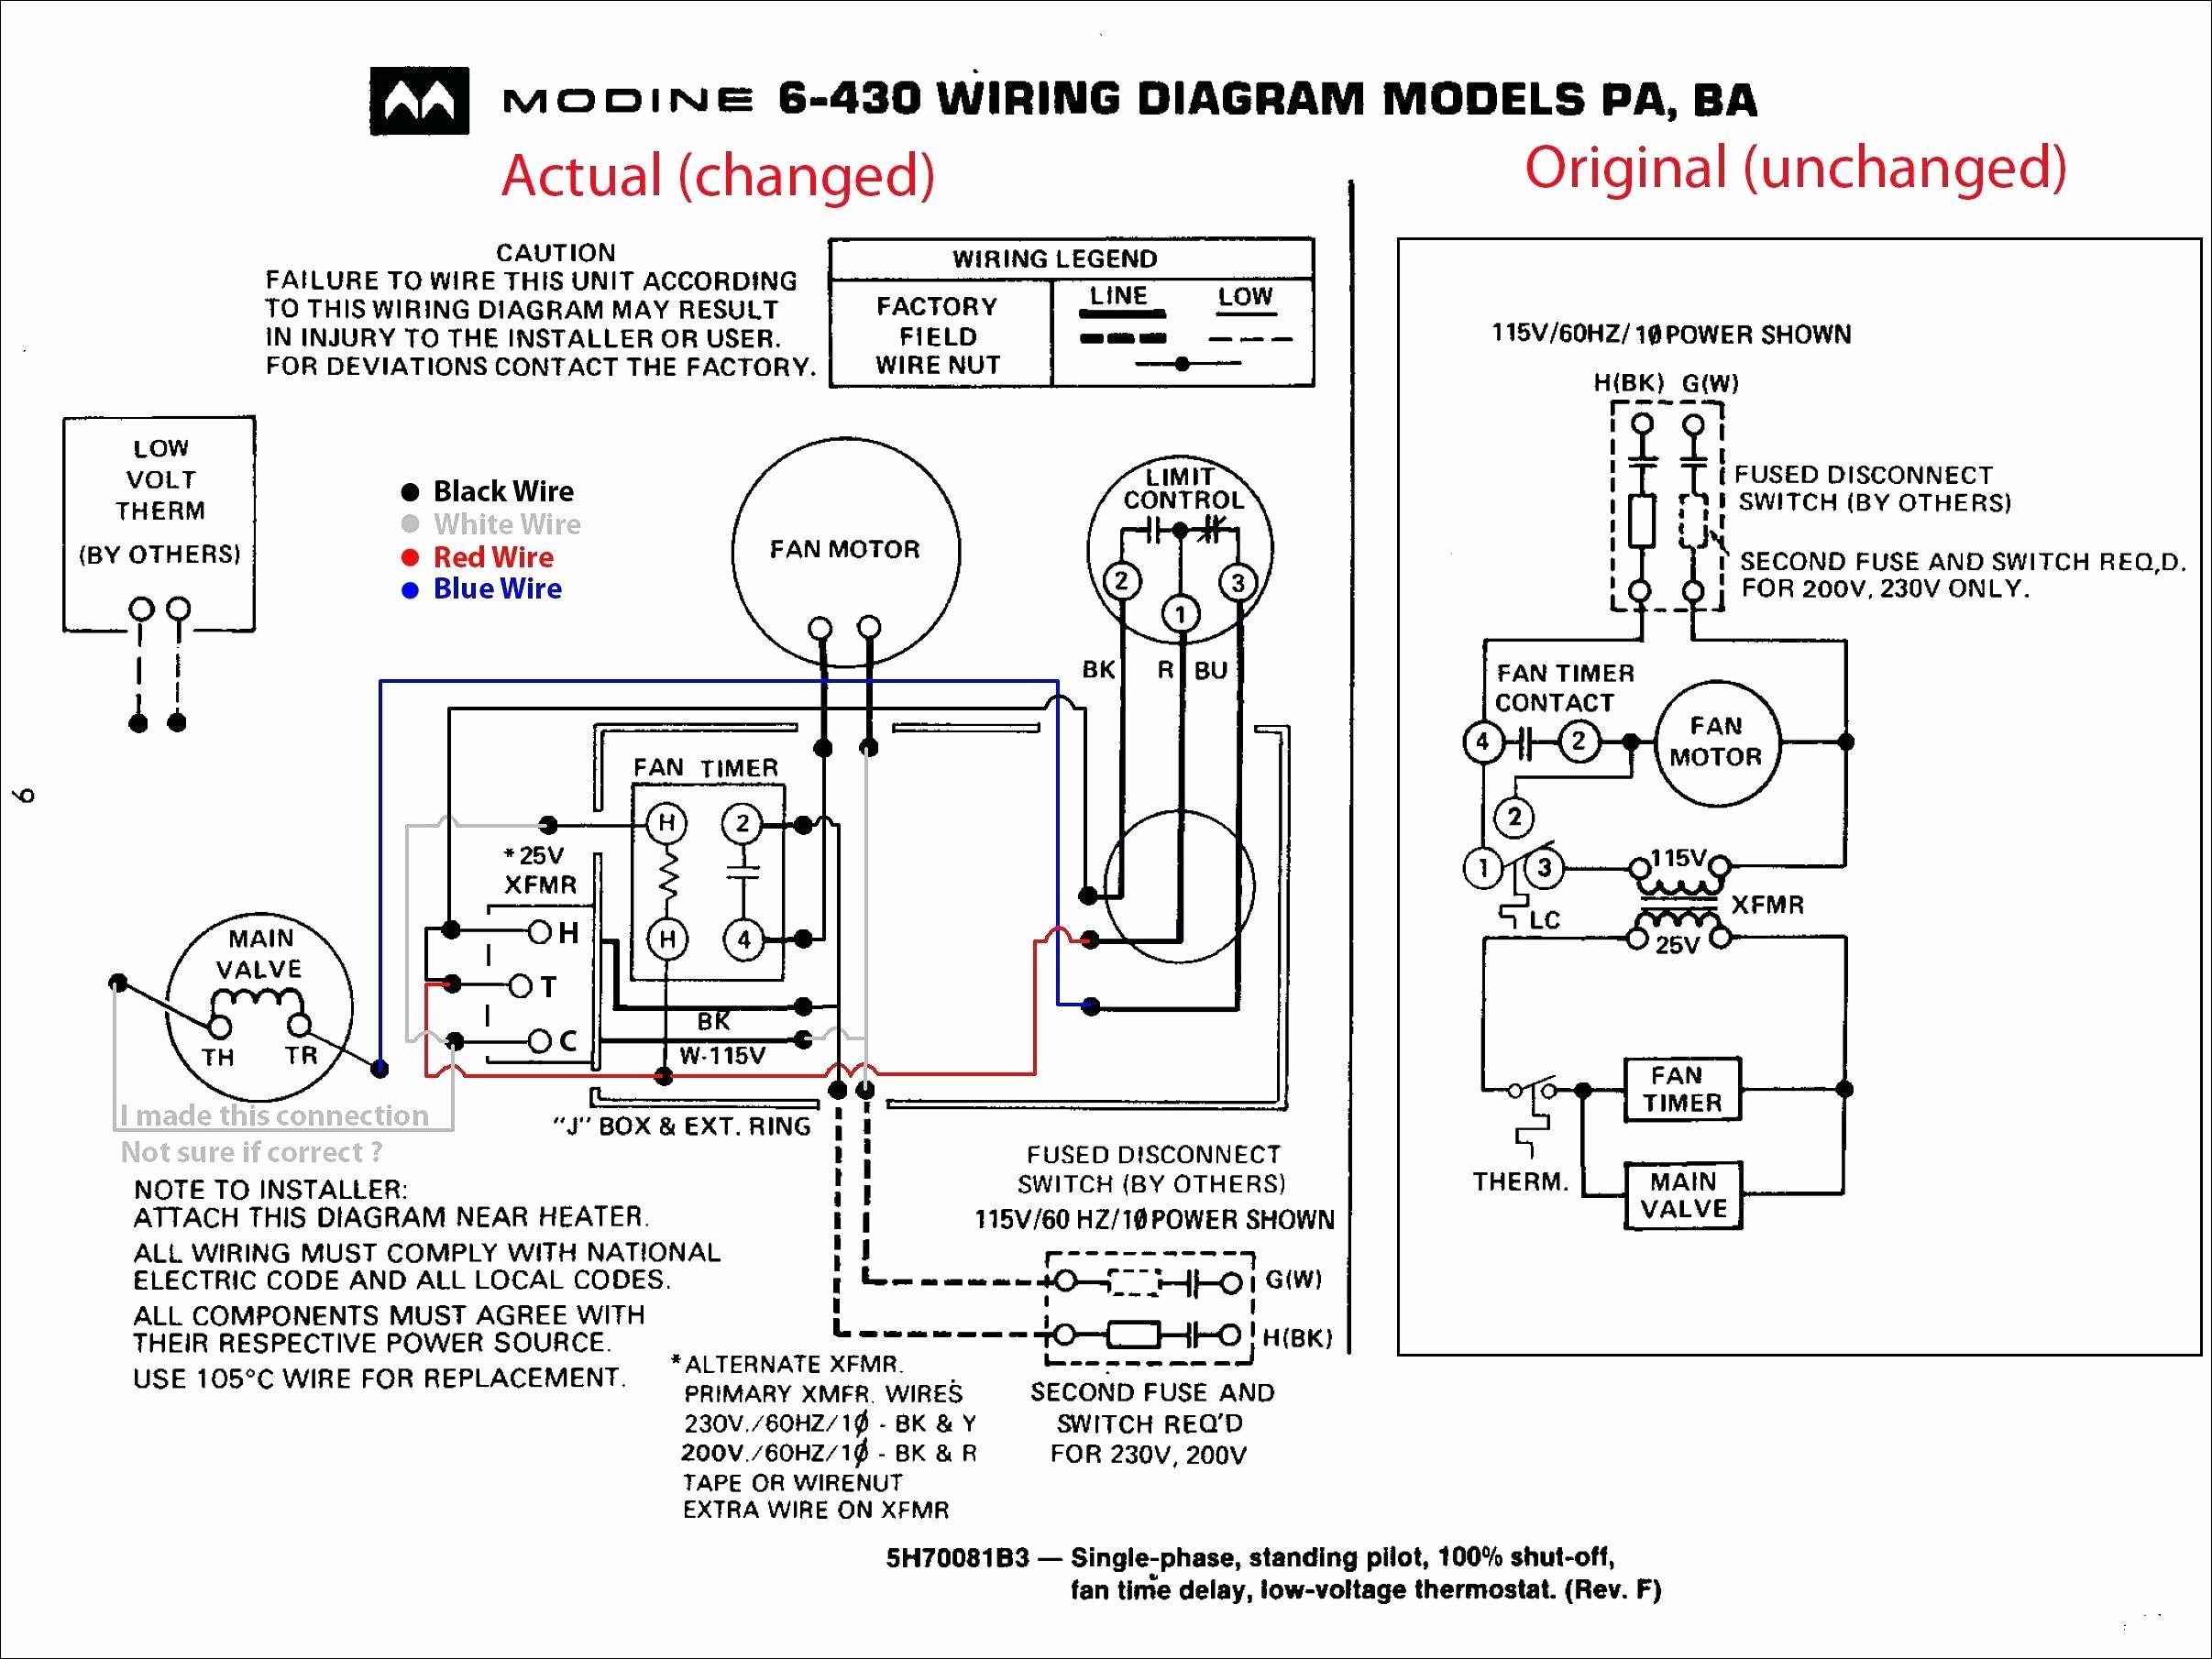 chromalox 6040rrr001 t stat wiring diagram carbonvote mudit blog \u2022